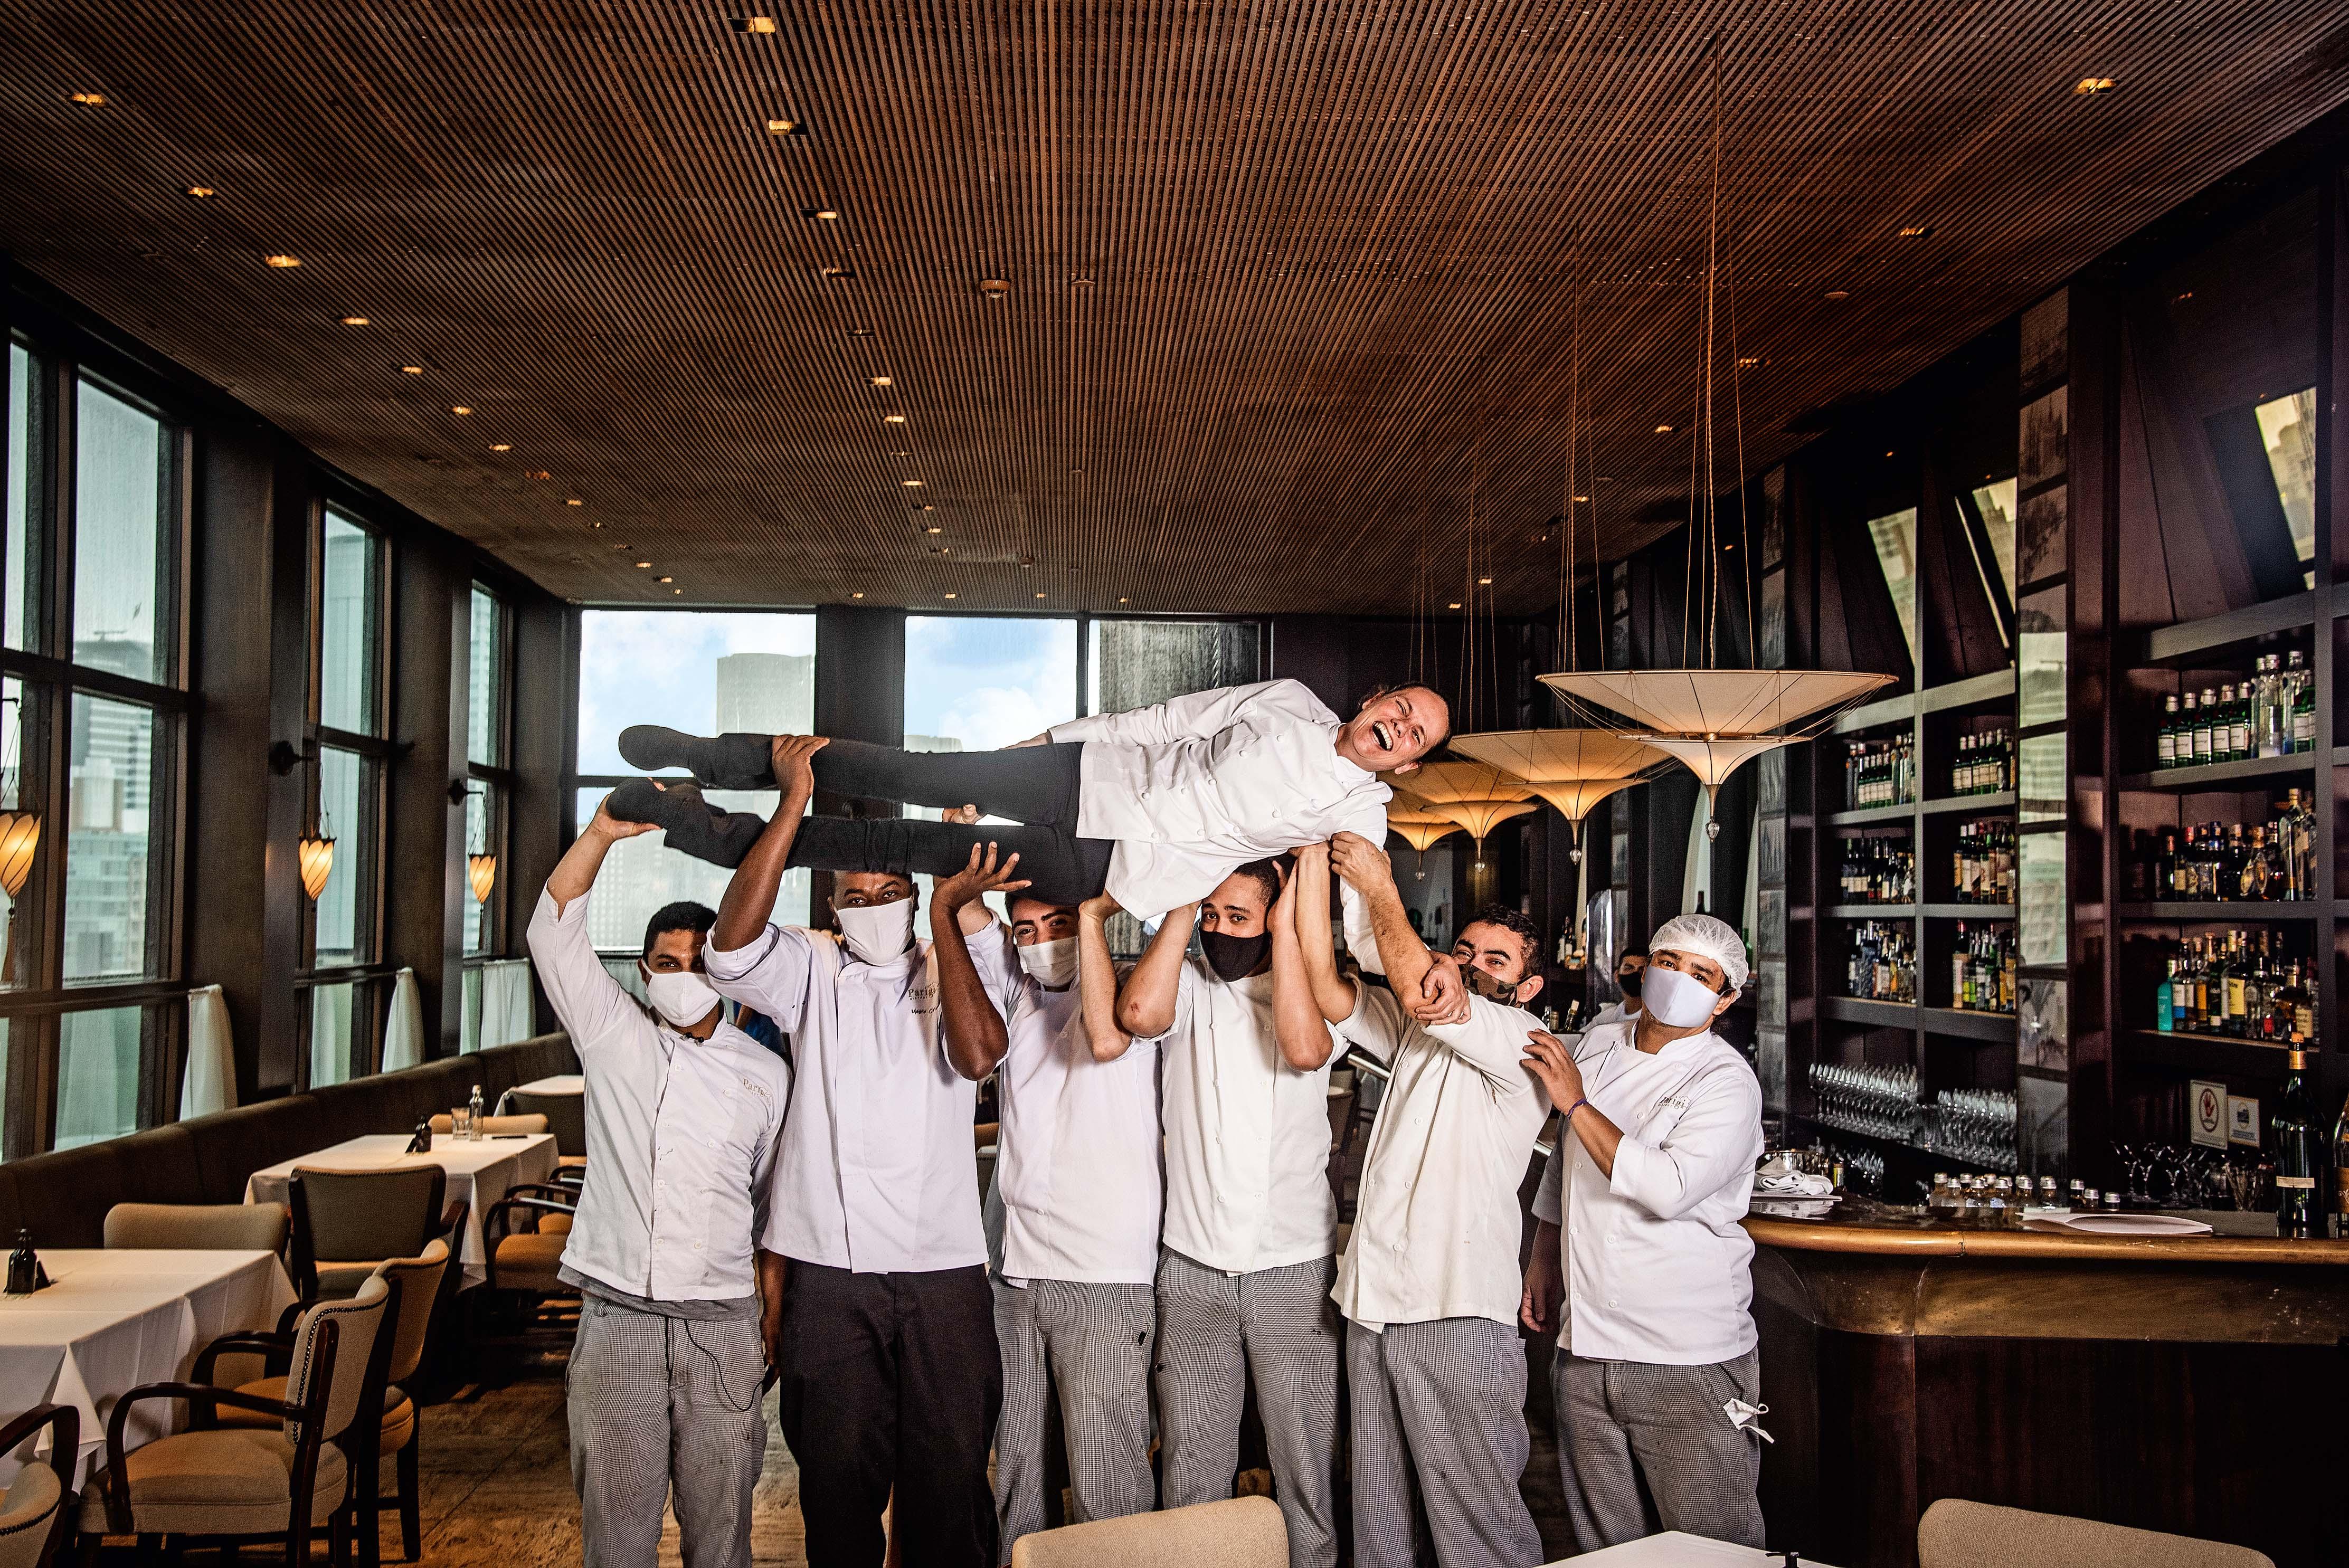 Comer & Beber 2020/2021 - Restaurantes - Chef do Ano - Vanessa Silva